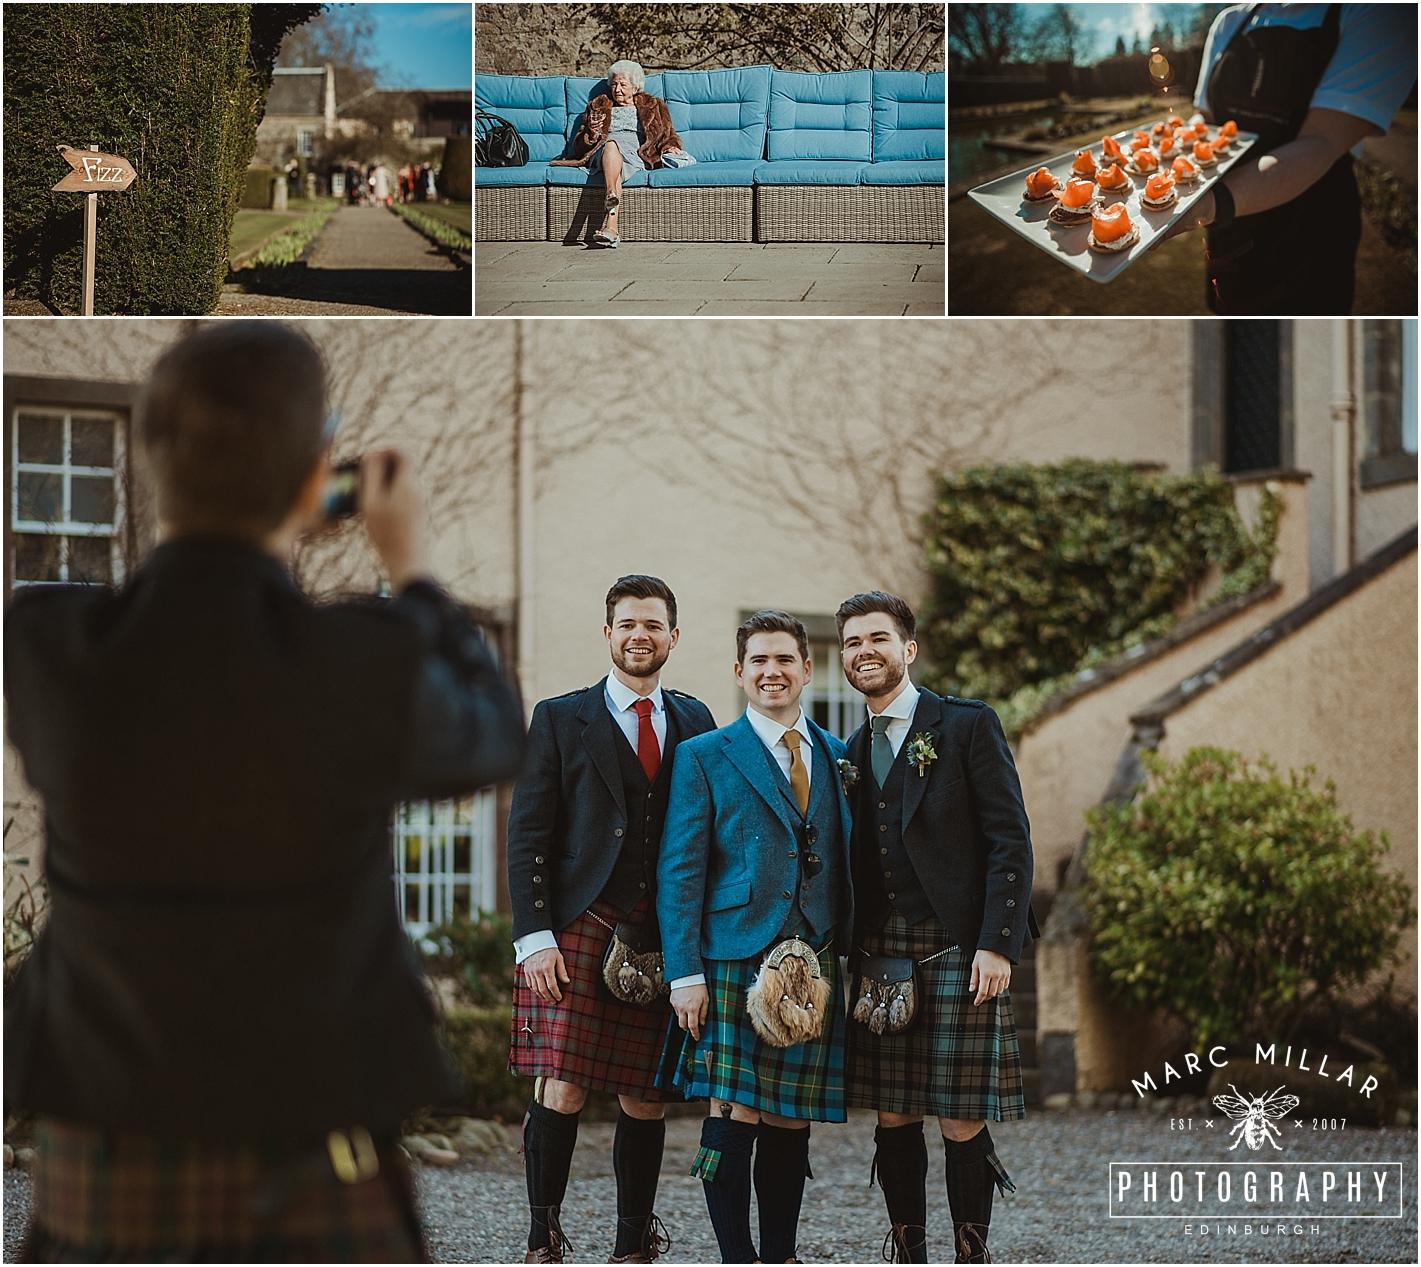 Myres Castle Wedding Shoot by Marc Millar Photography